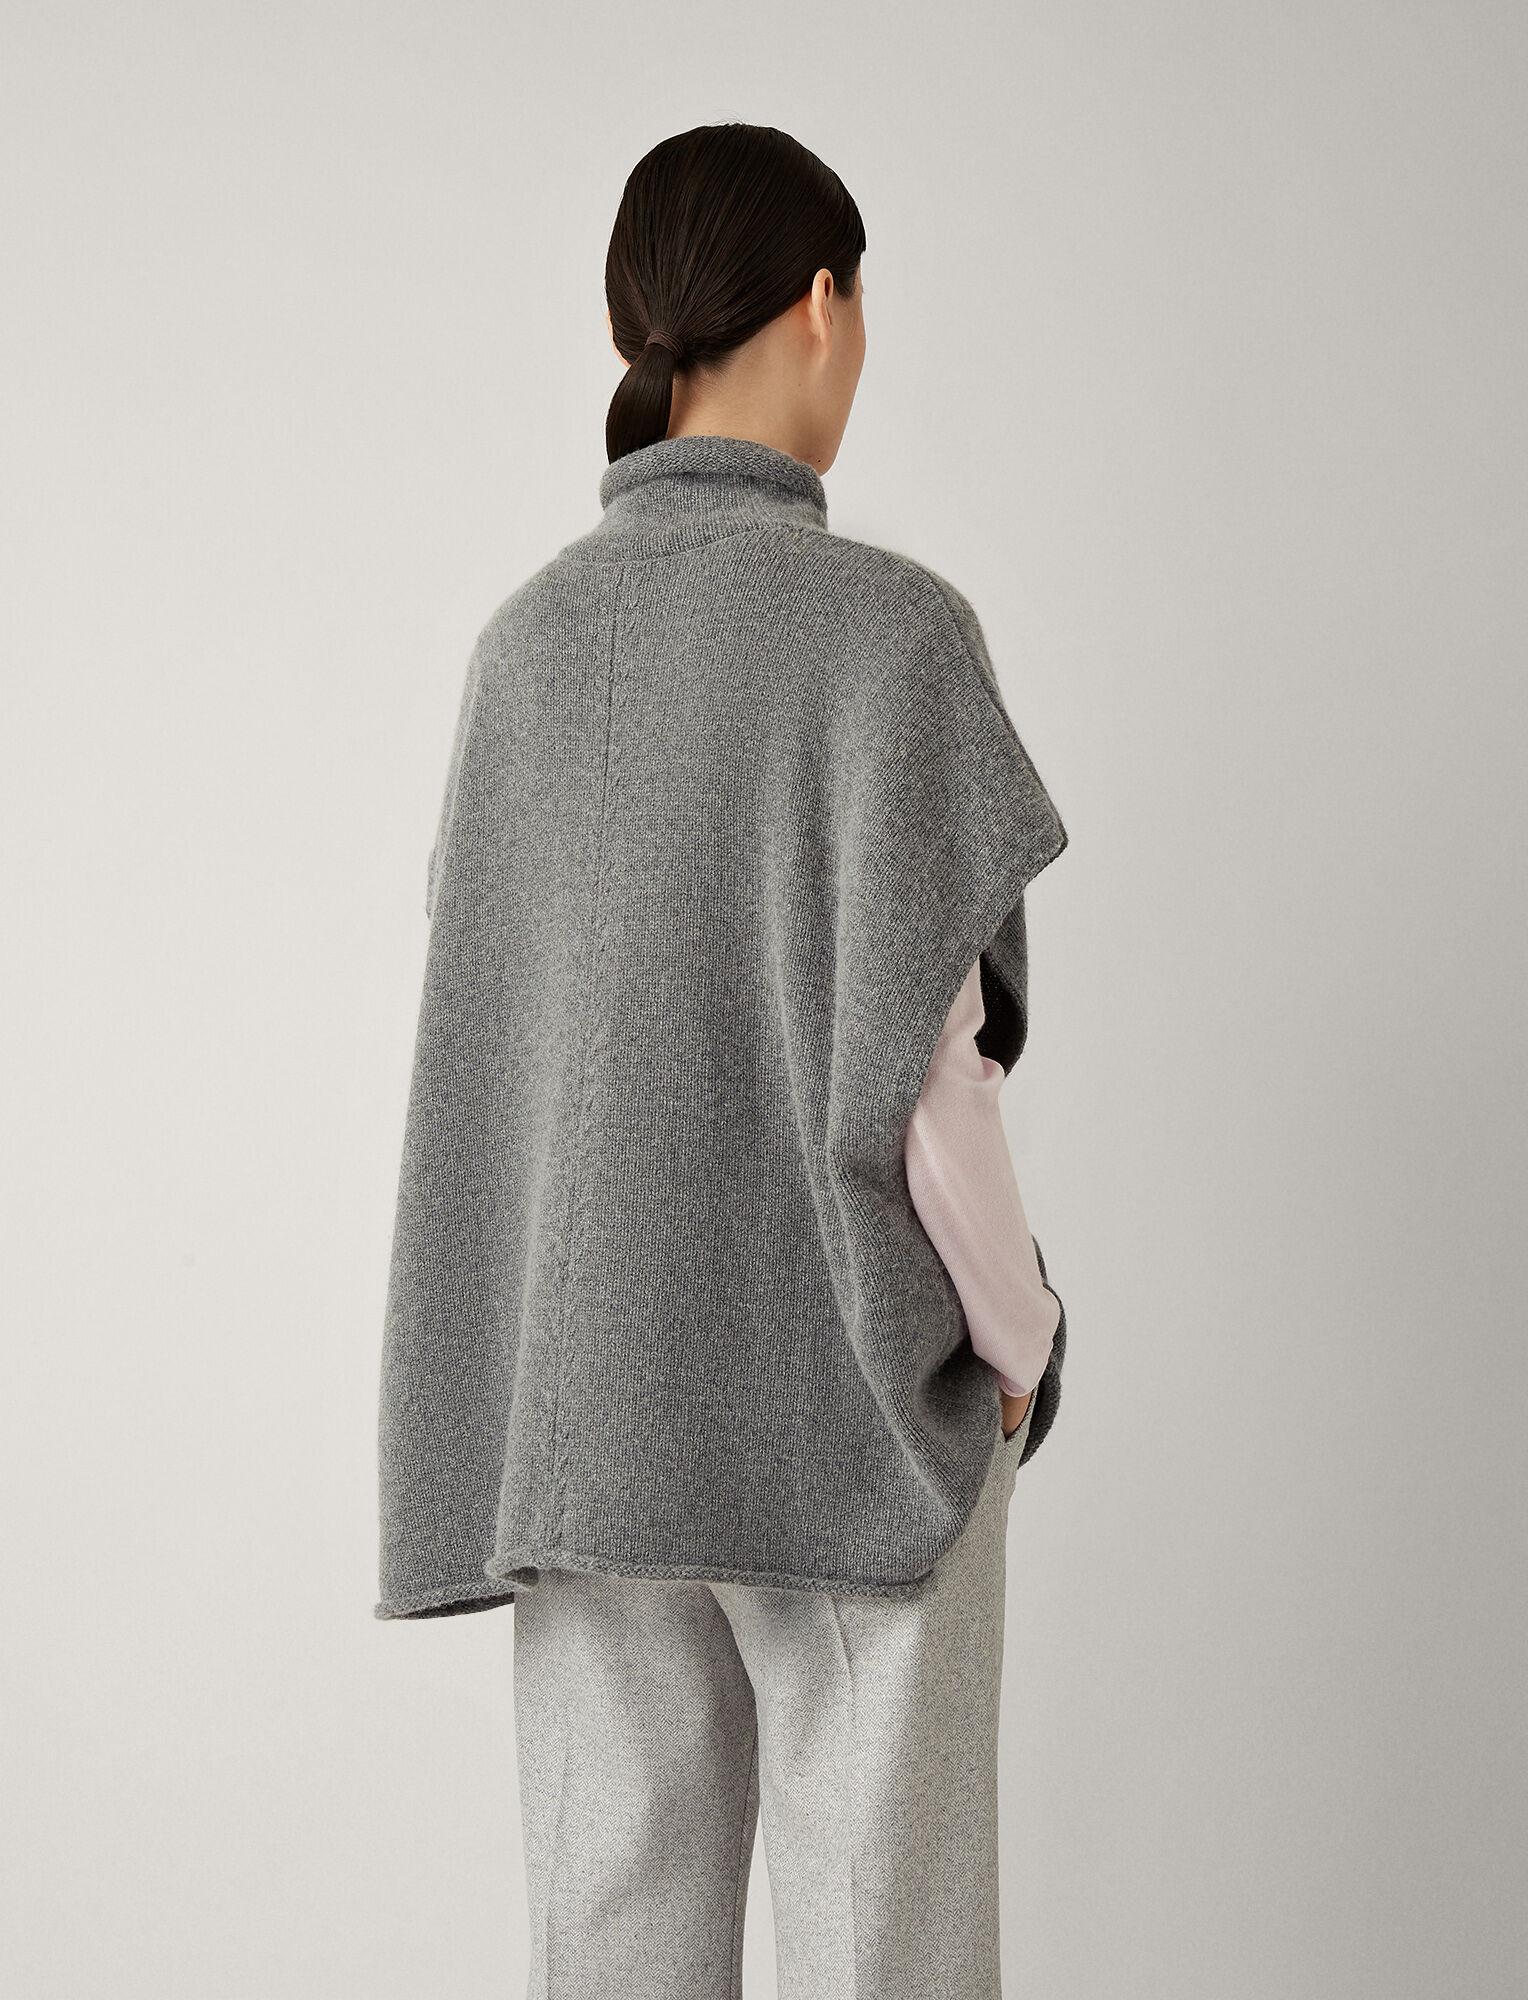 Joseph, Poncho Wool Cashmere Knit, in DARK GREY